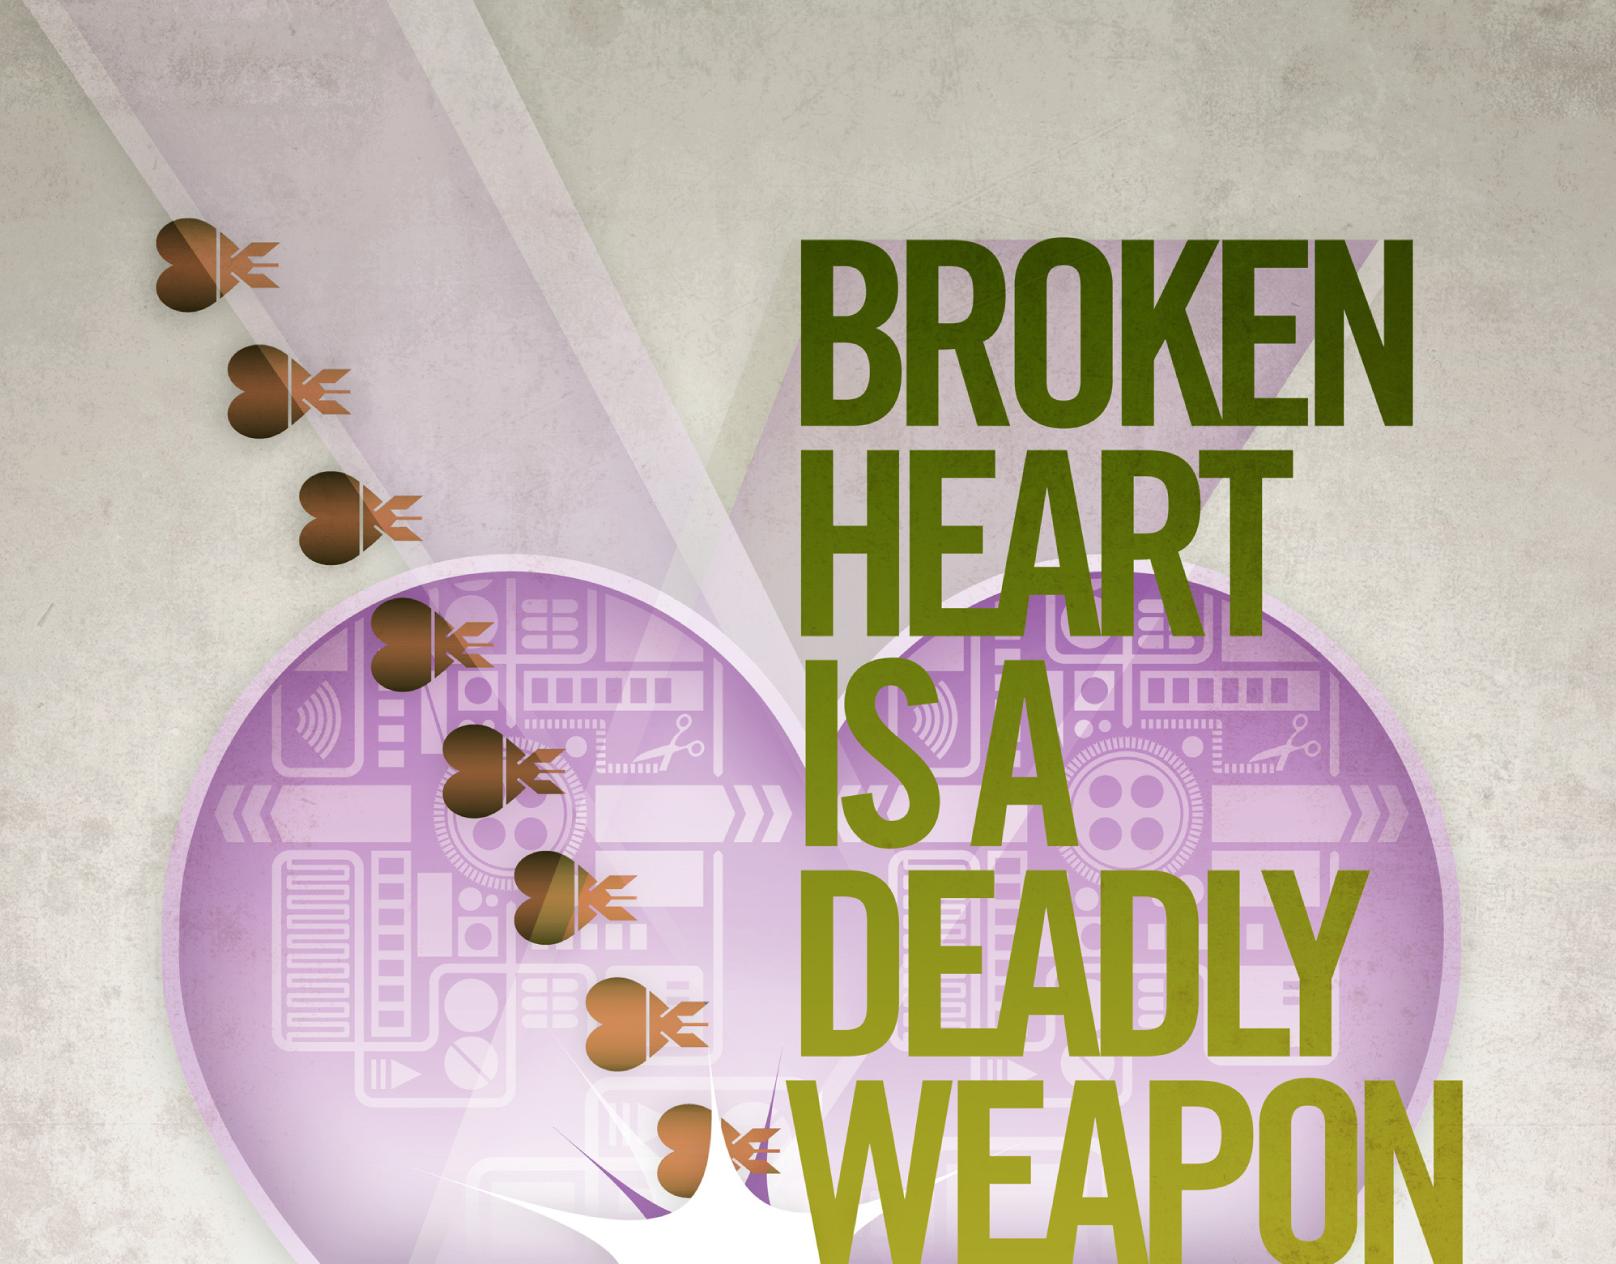 Broken Heart Is A Deadly Weapon